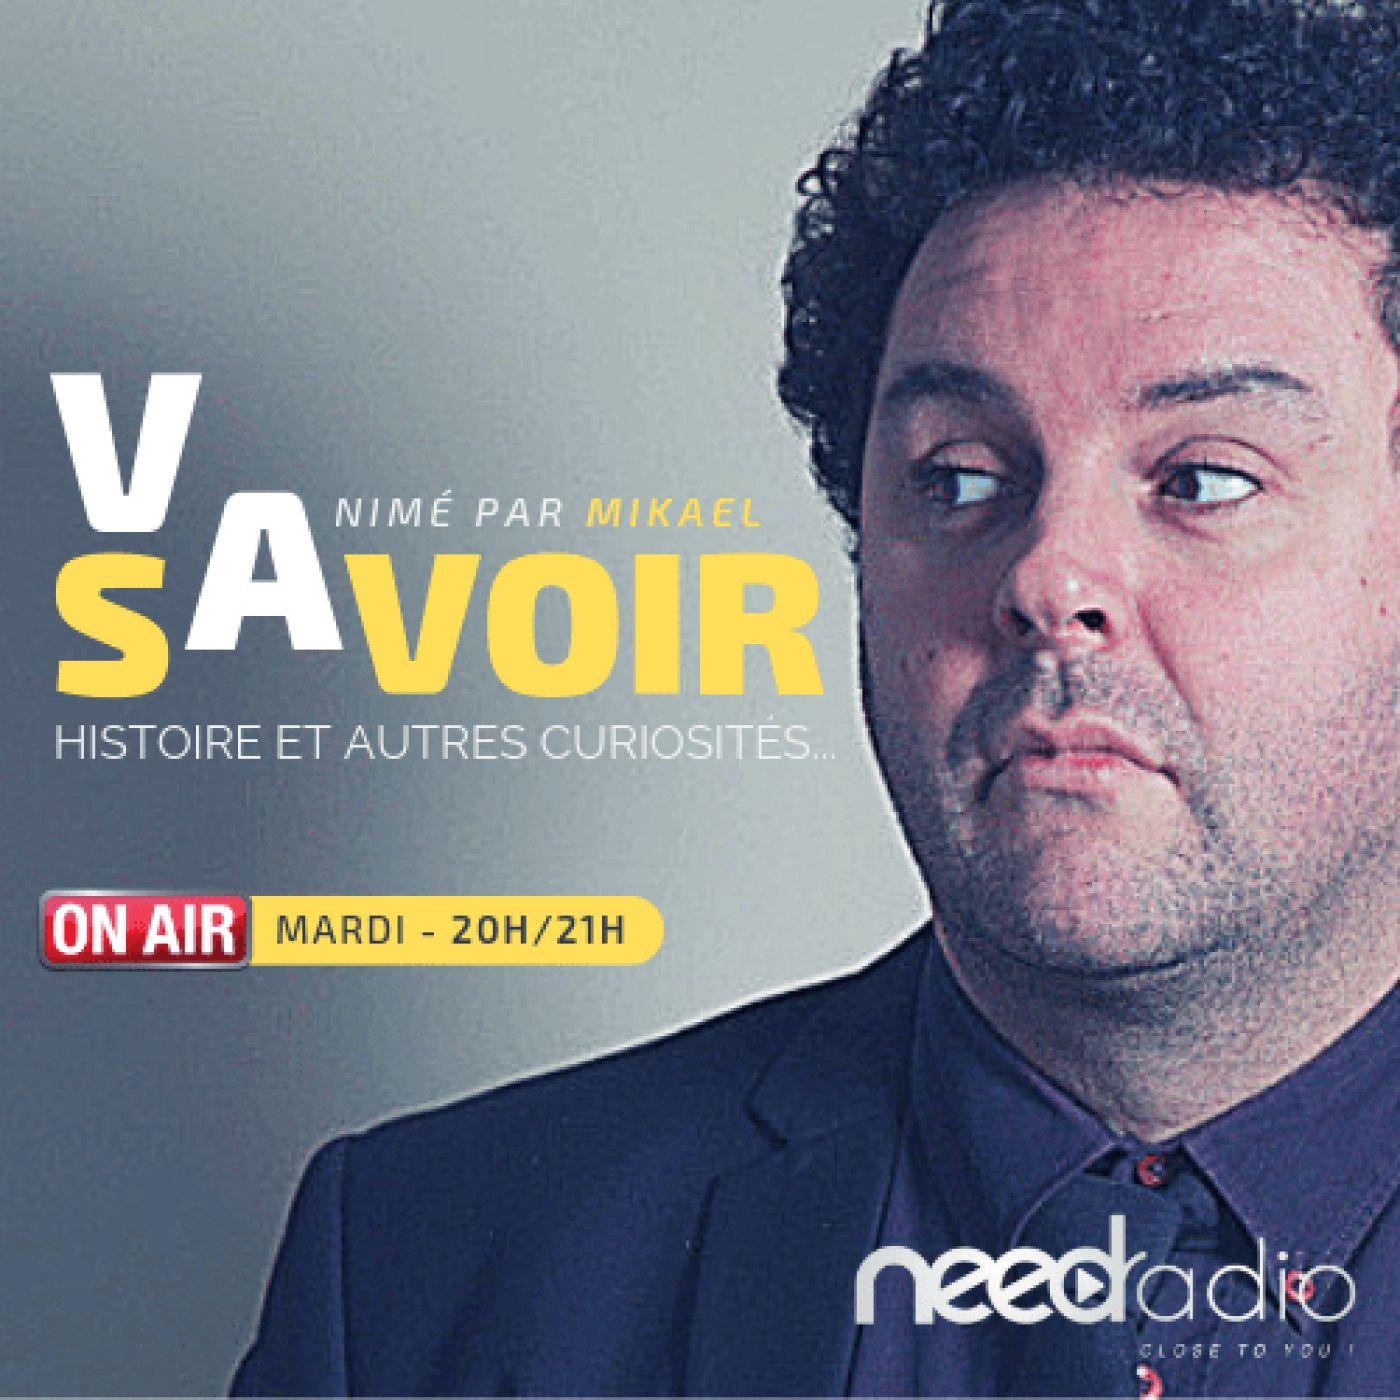 Va Savoir - Nomophonie (avec Mikael) (17/09/19)